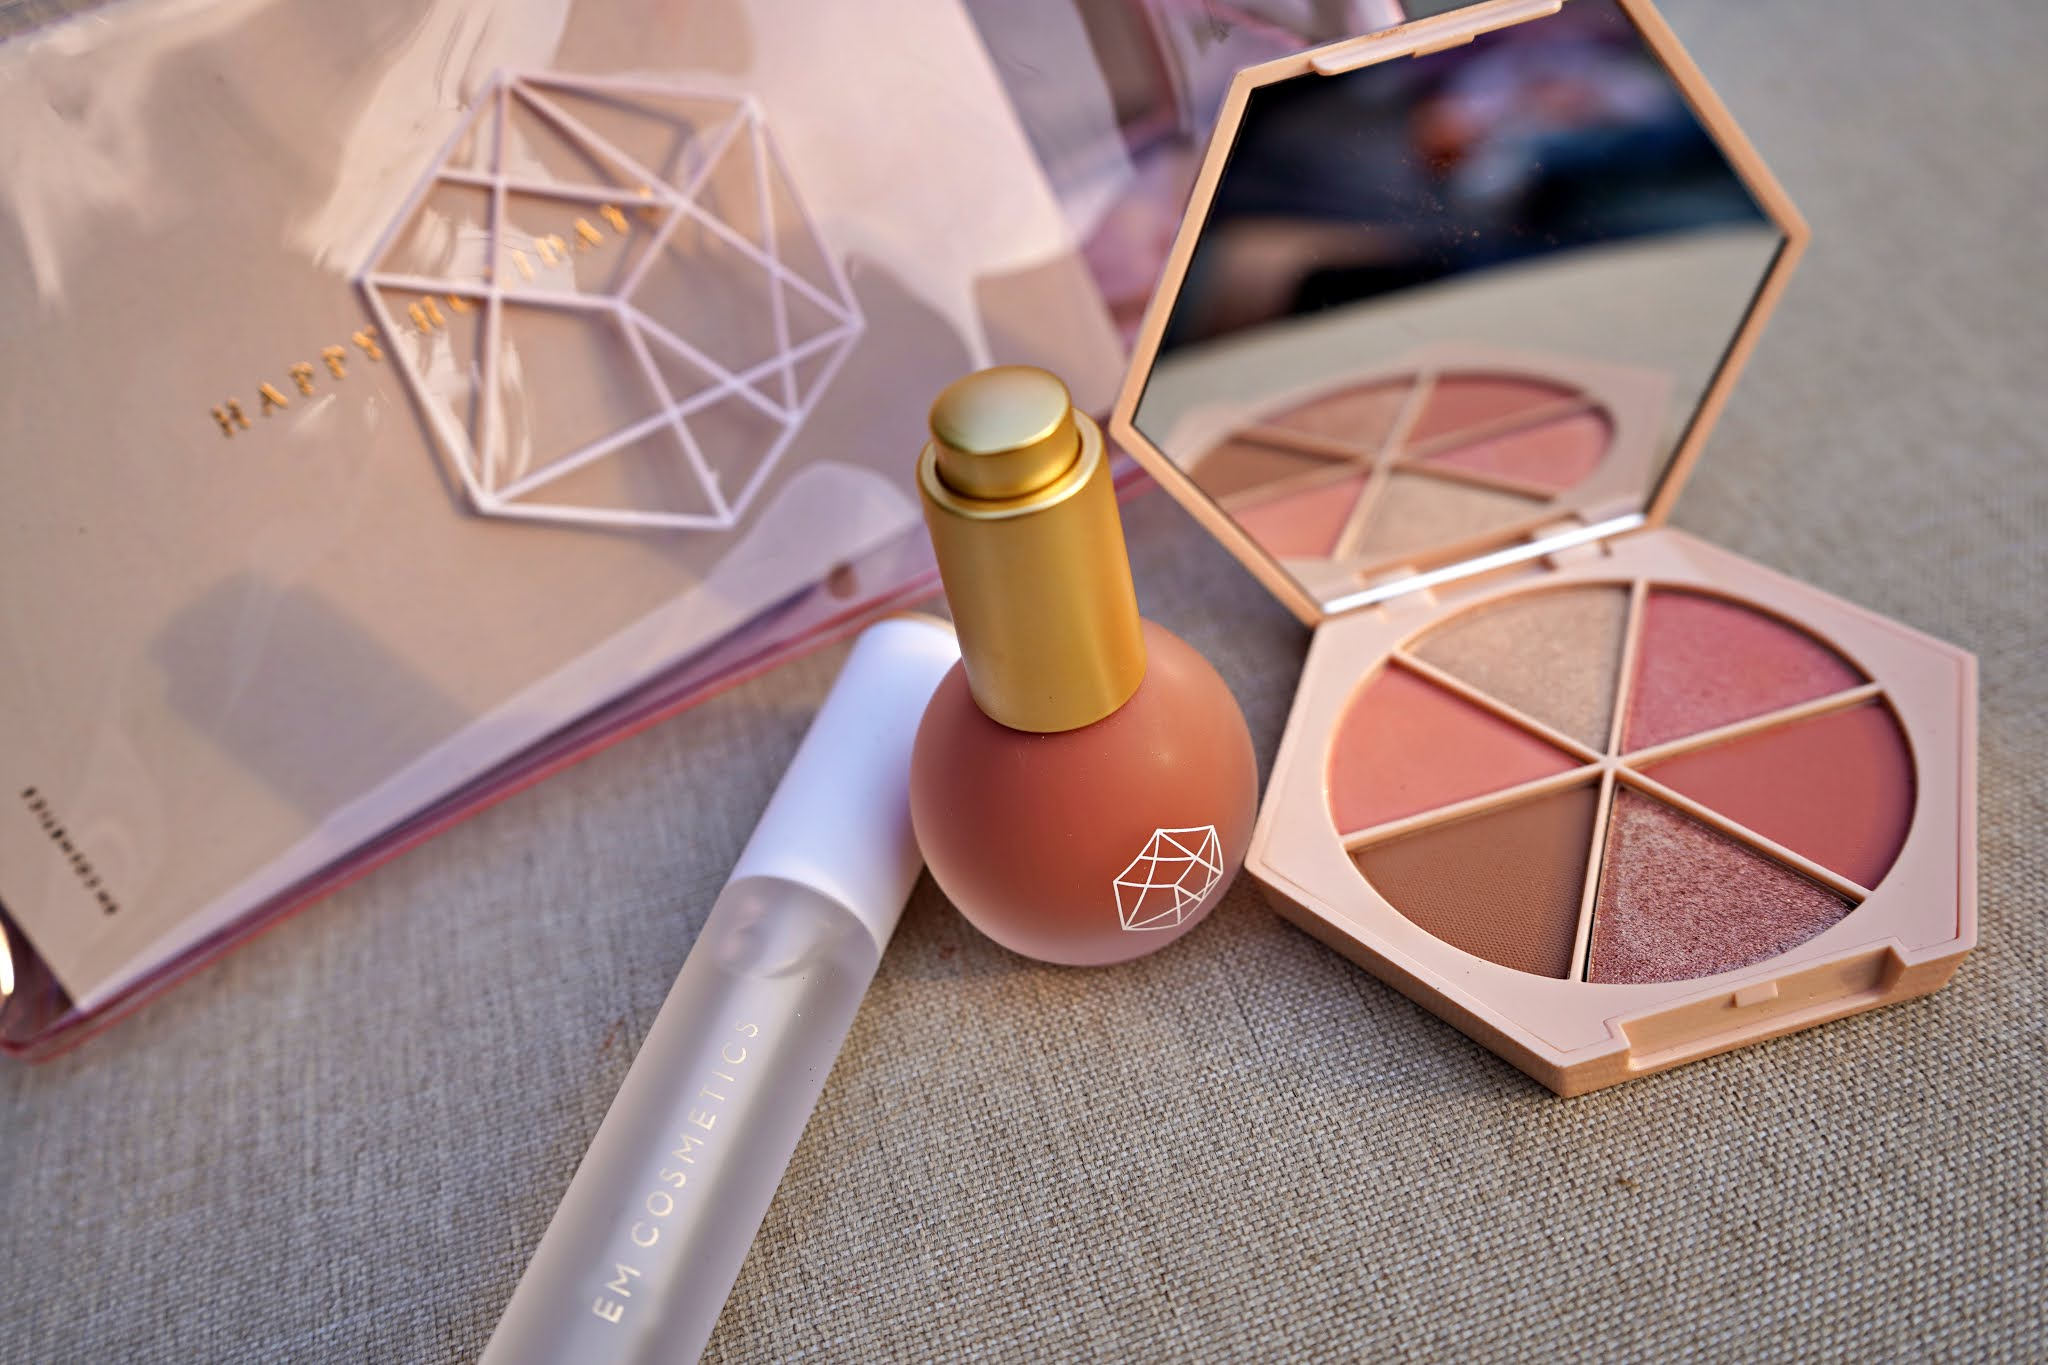 EM Cosmetics Starlight Glow Trio makeup